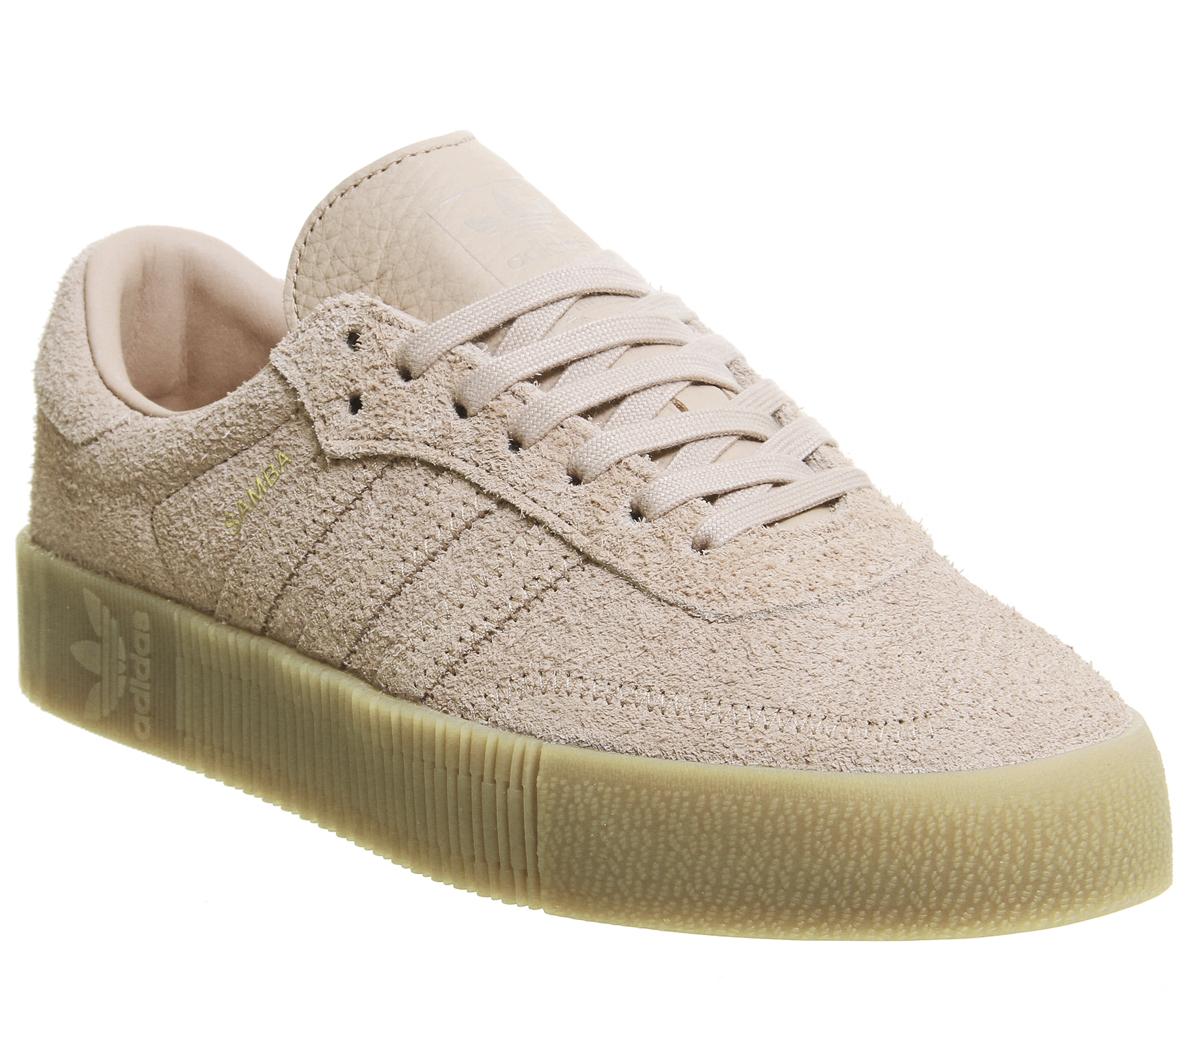 26acb14a8c1 Sentinel Womens Adidas Samba Rose Trainers Ash Pearl Gum Trainers Shoes